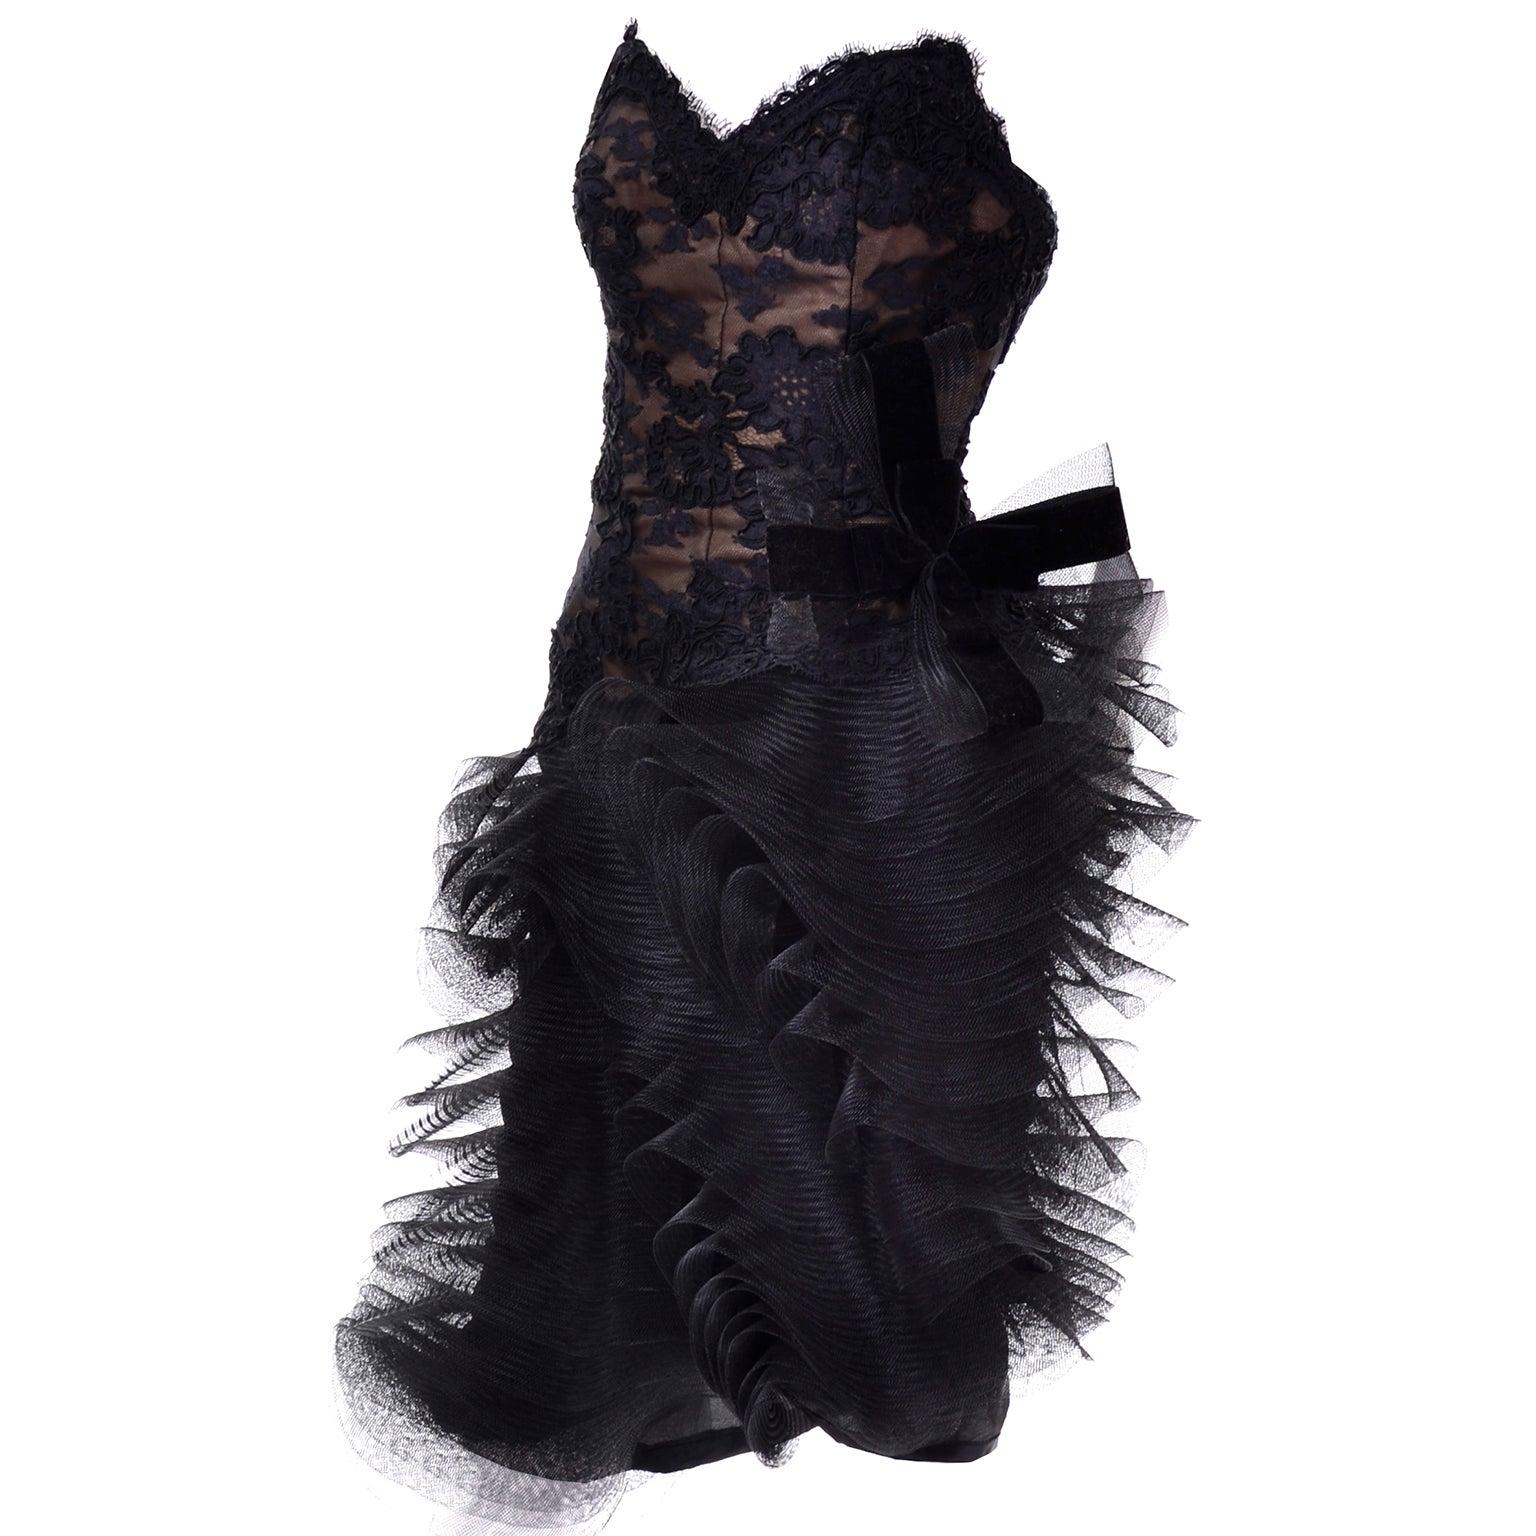 Victor Costa Elizabeth Arden Black Sculpted Avant Garde Vintage Dress